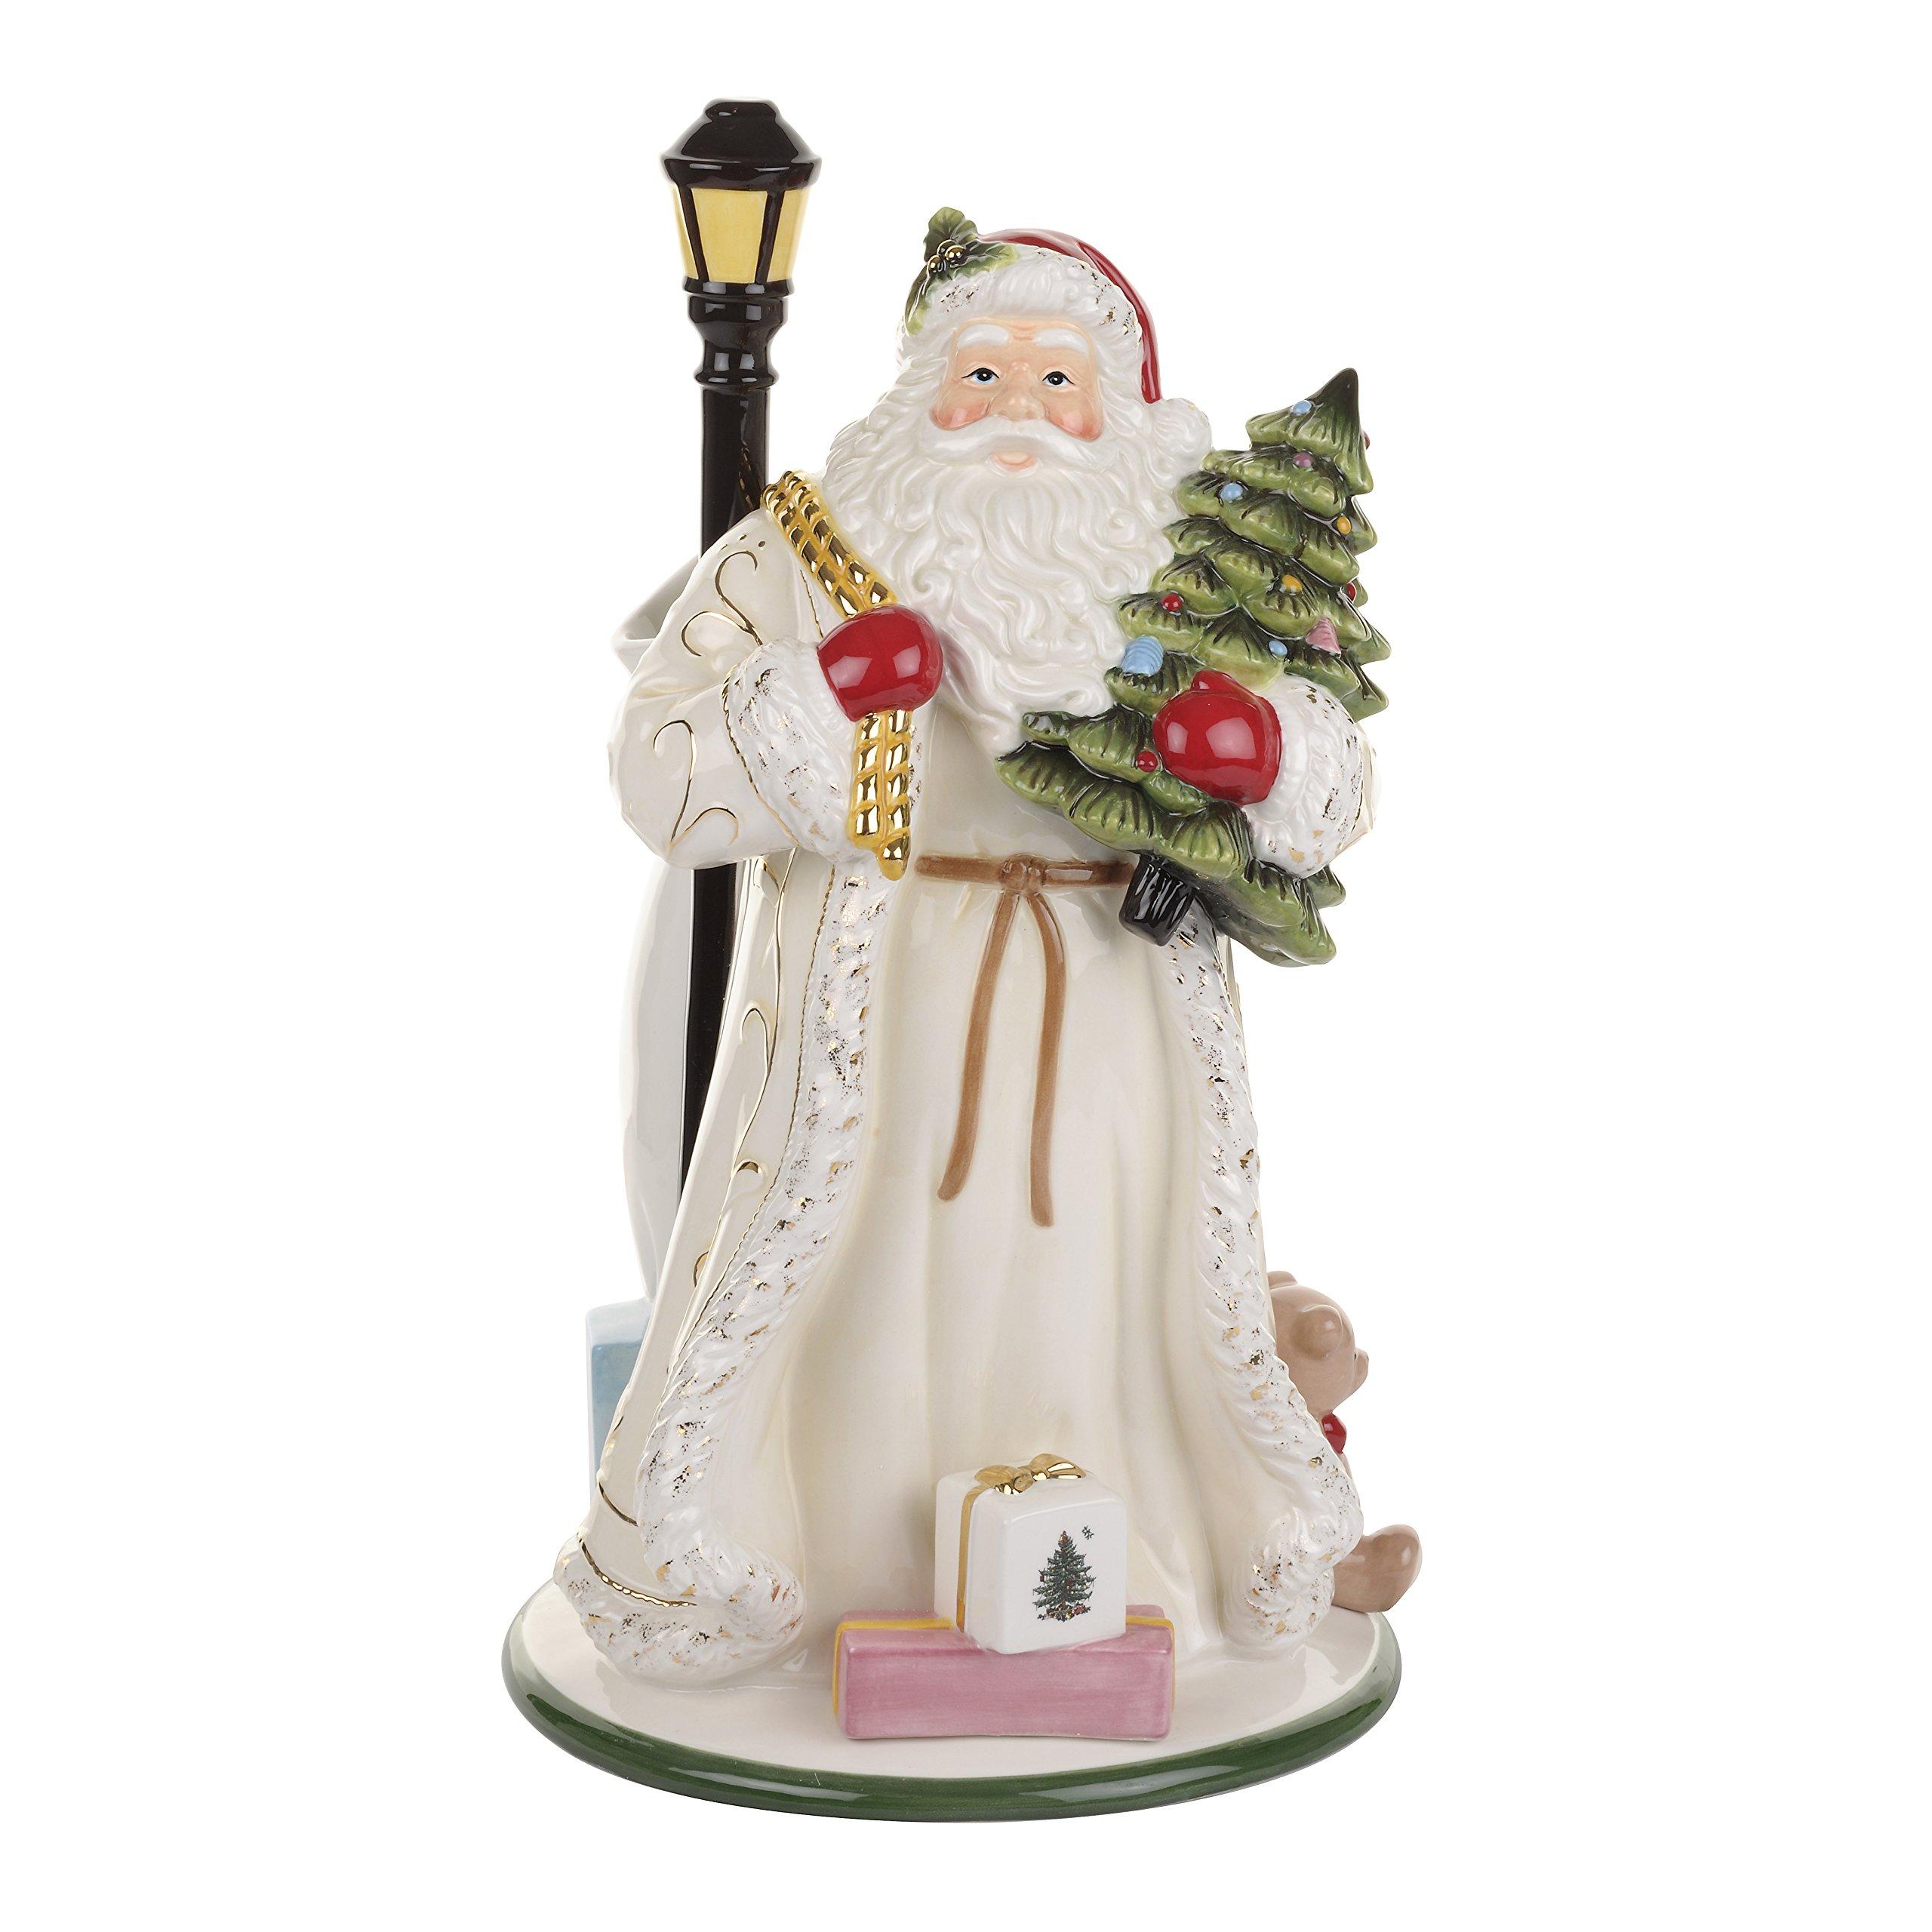 Spode Christmas Tree Santa Vase, Gold